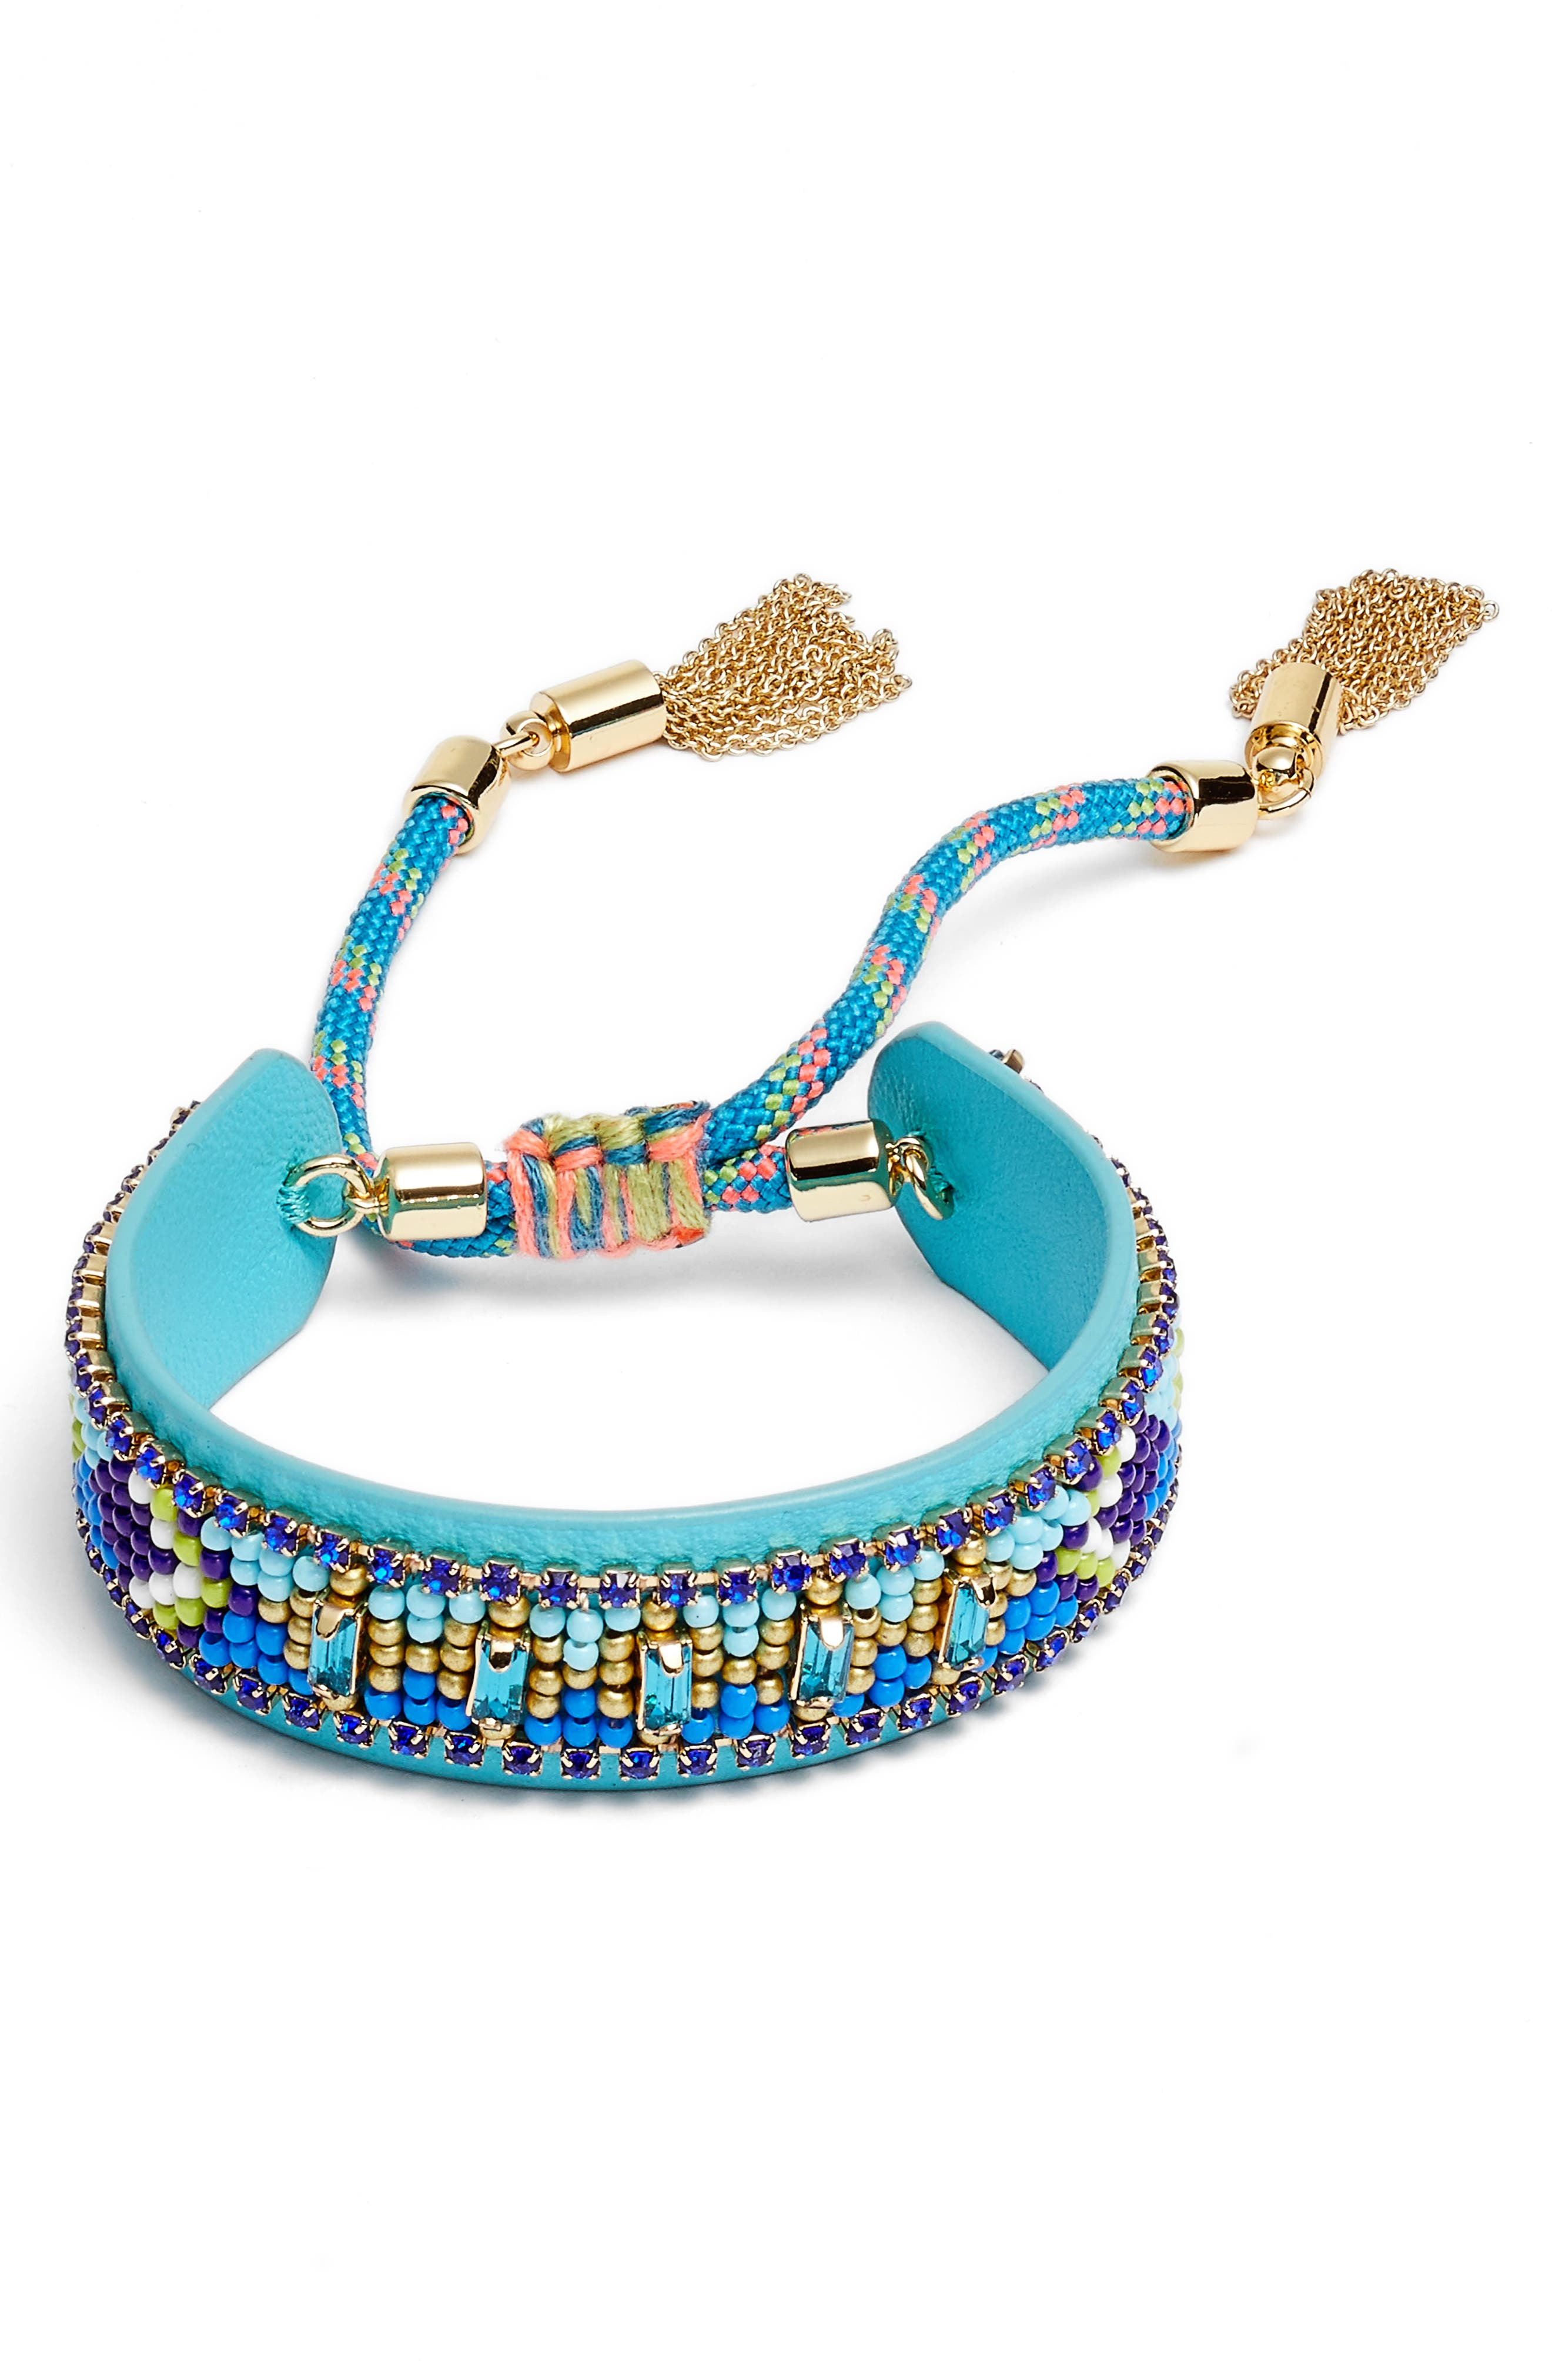 Zigzag Beaded Leather Friendship Bracelet,                             Main thumbnail 1, color,